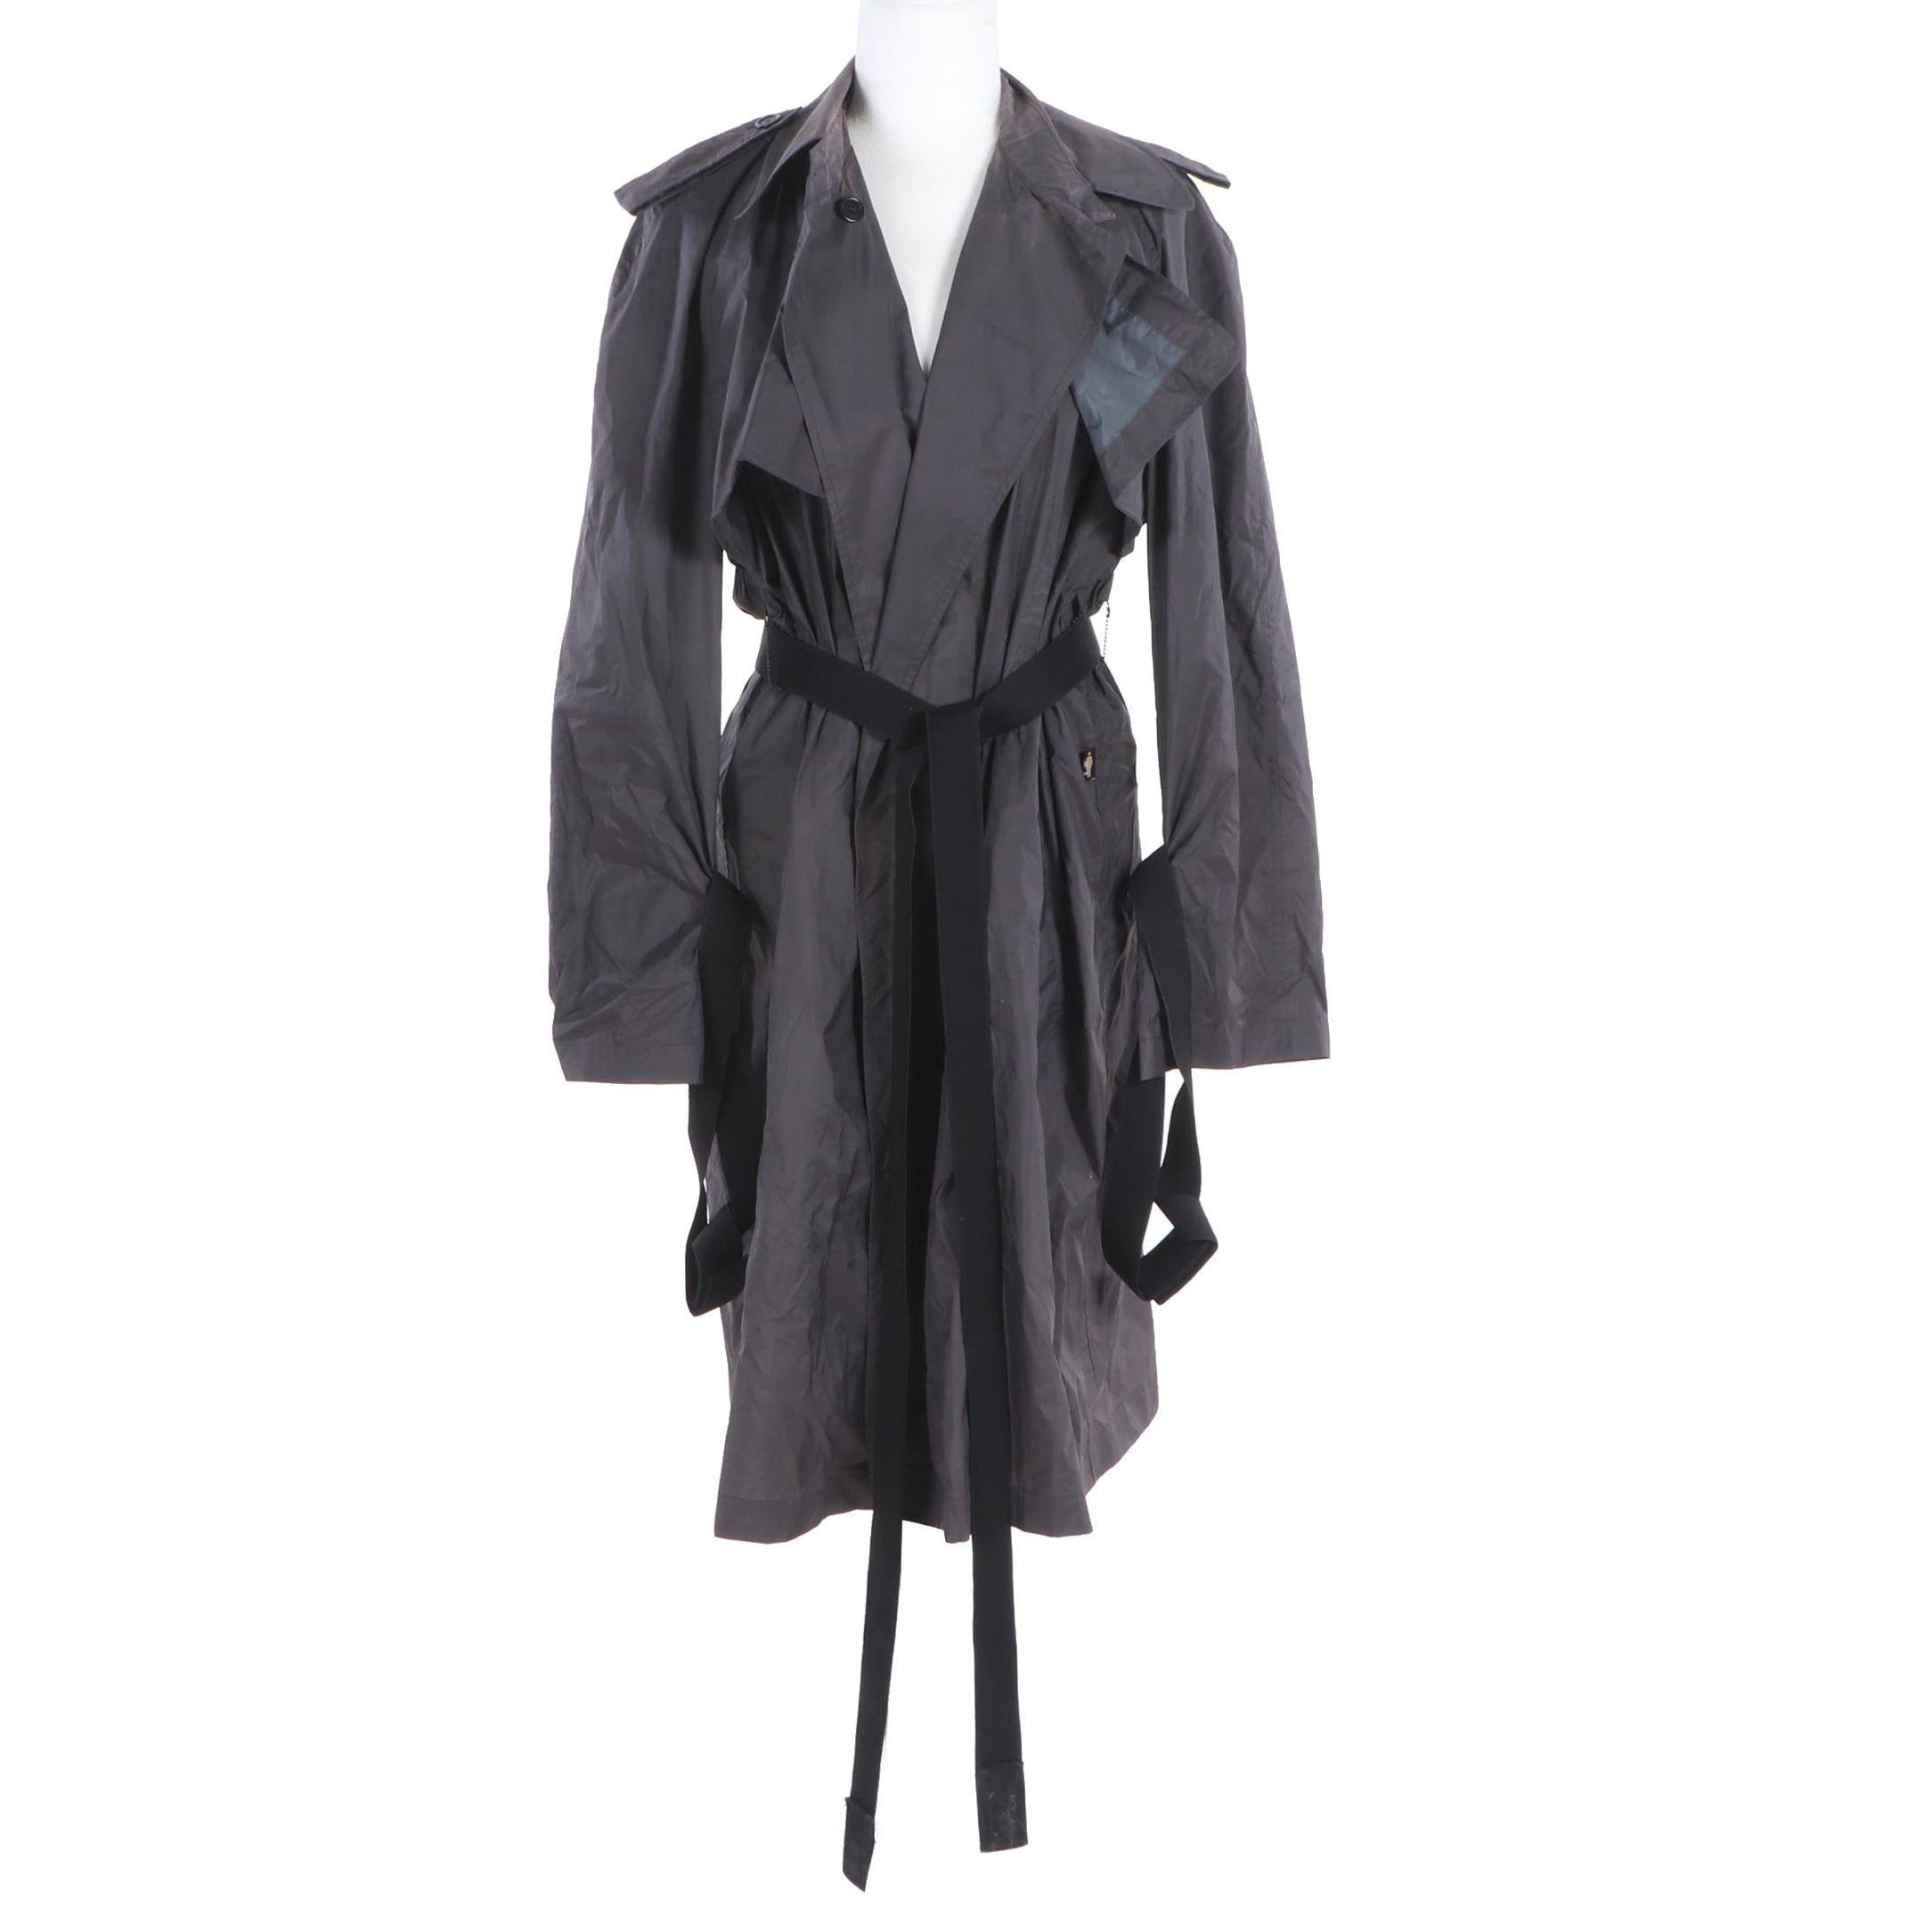 JPG. Jean's by Gaultier Raincoat with Tie Belt